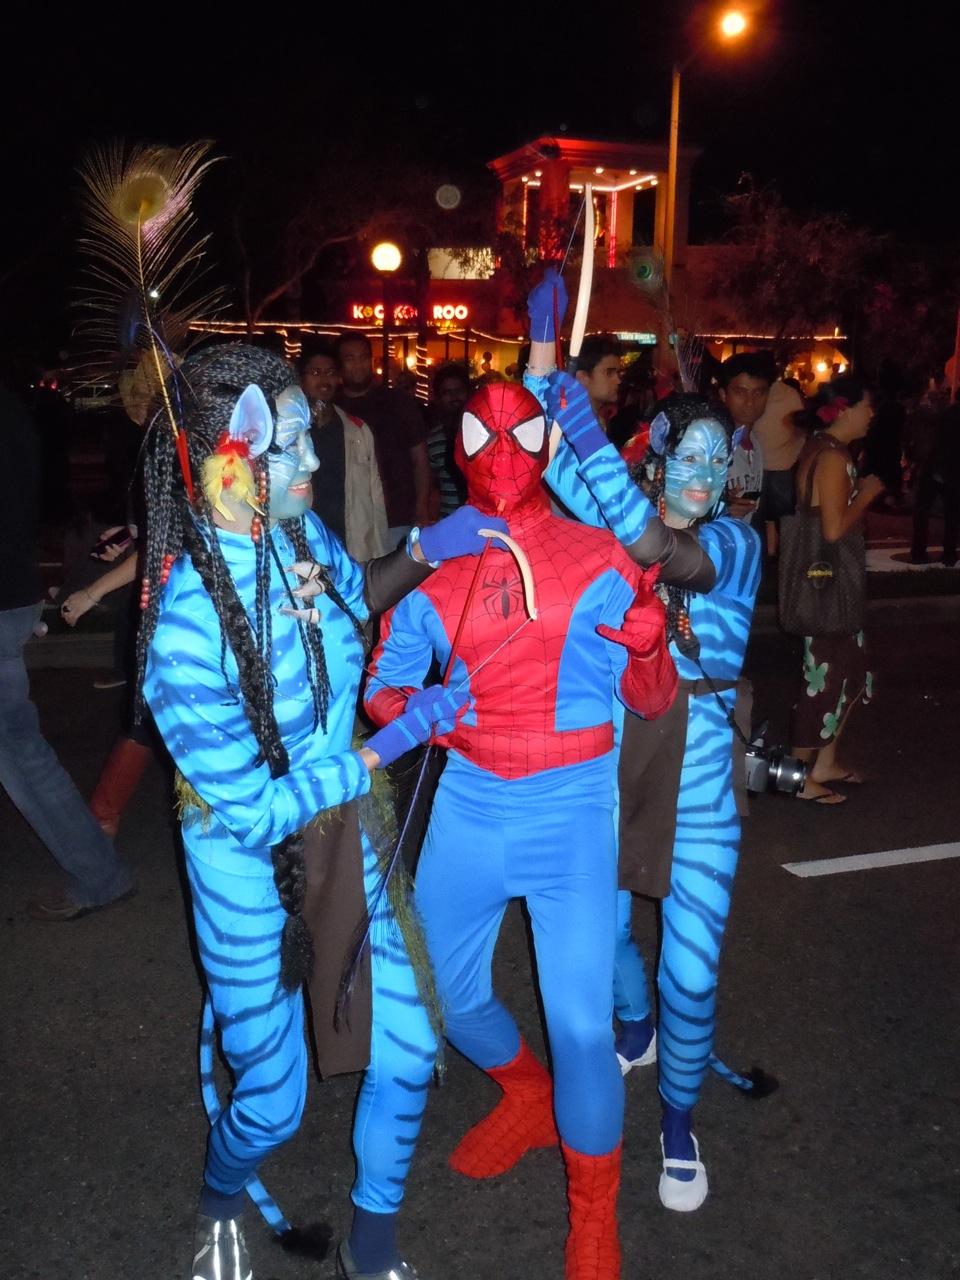 avatar aliens west hollywood halloween carnaval 2010. Black Bedroom Furniture Sets. Home Design Ideas